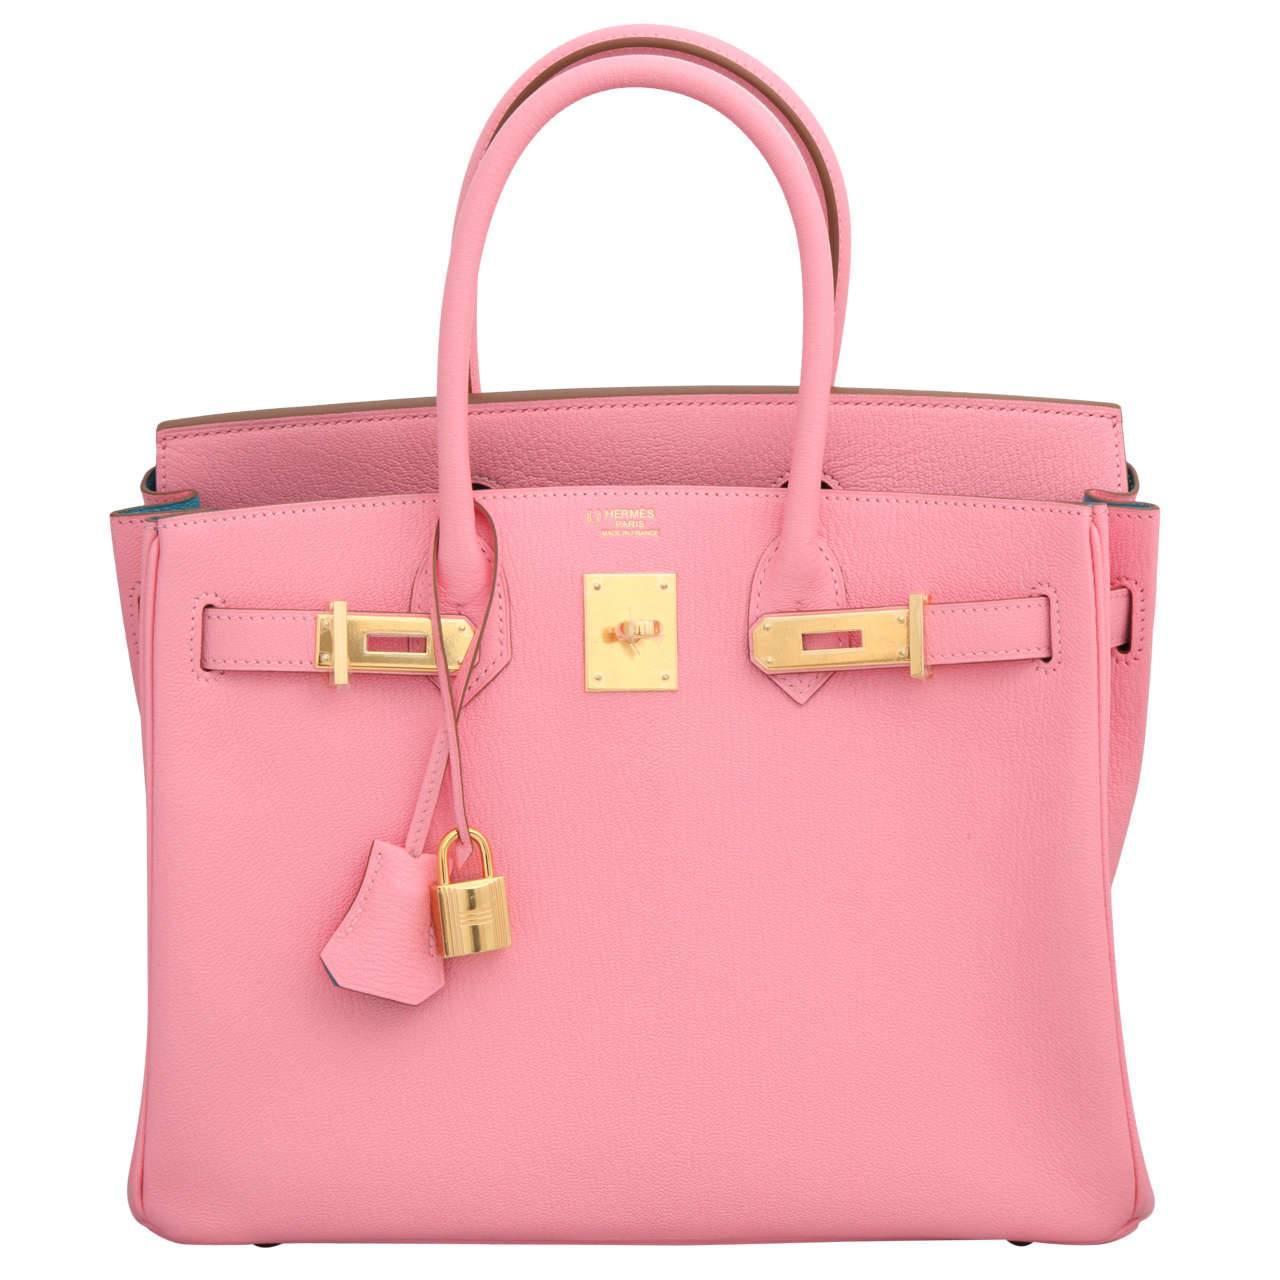 003d41d00a Hermes Rose Confetti Pink